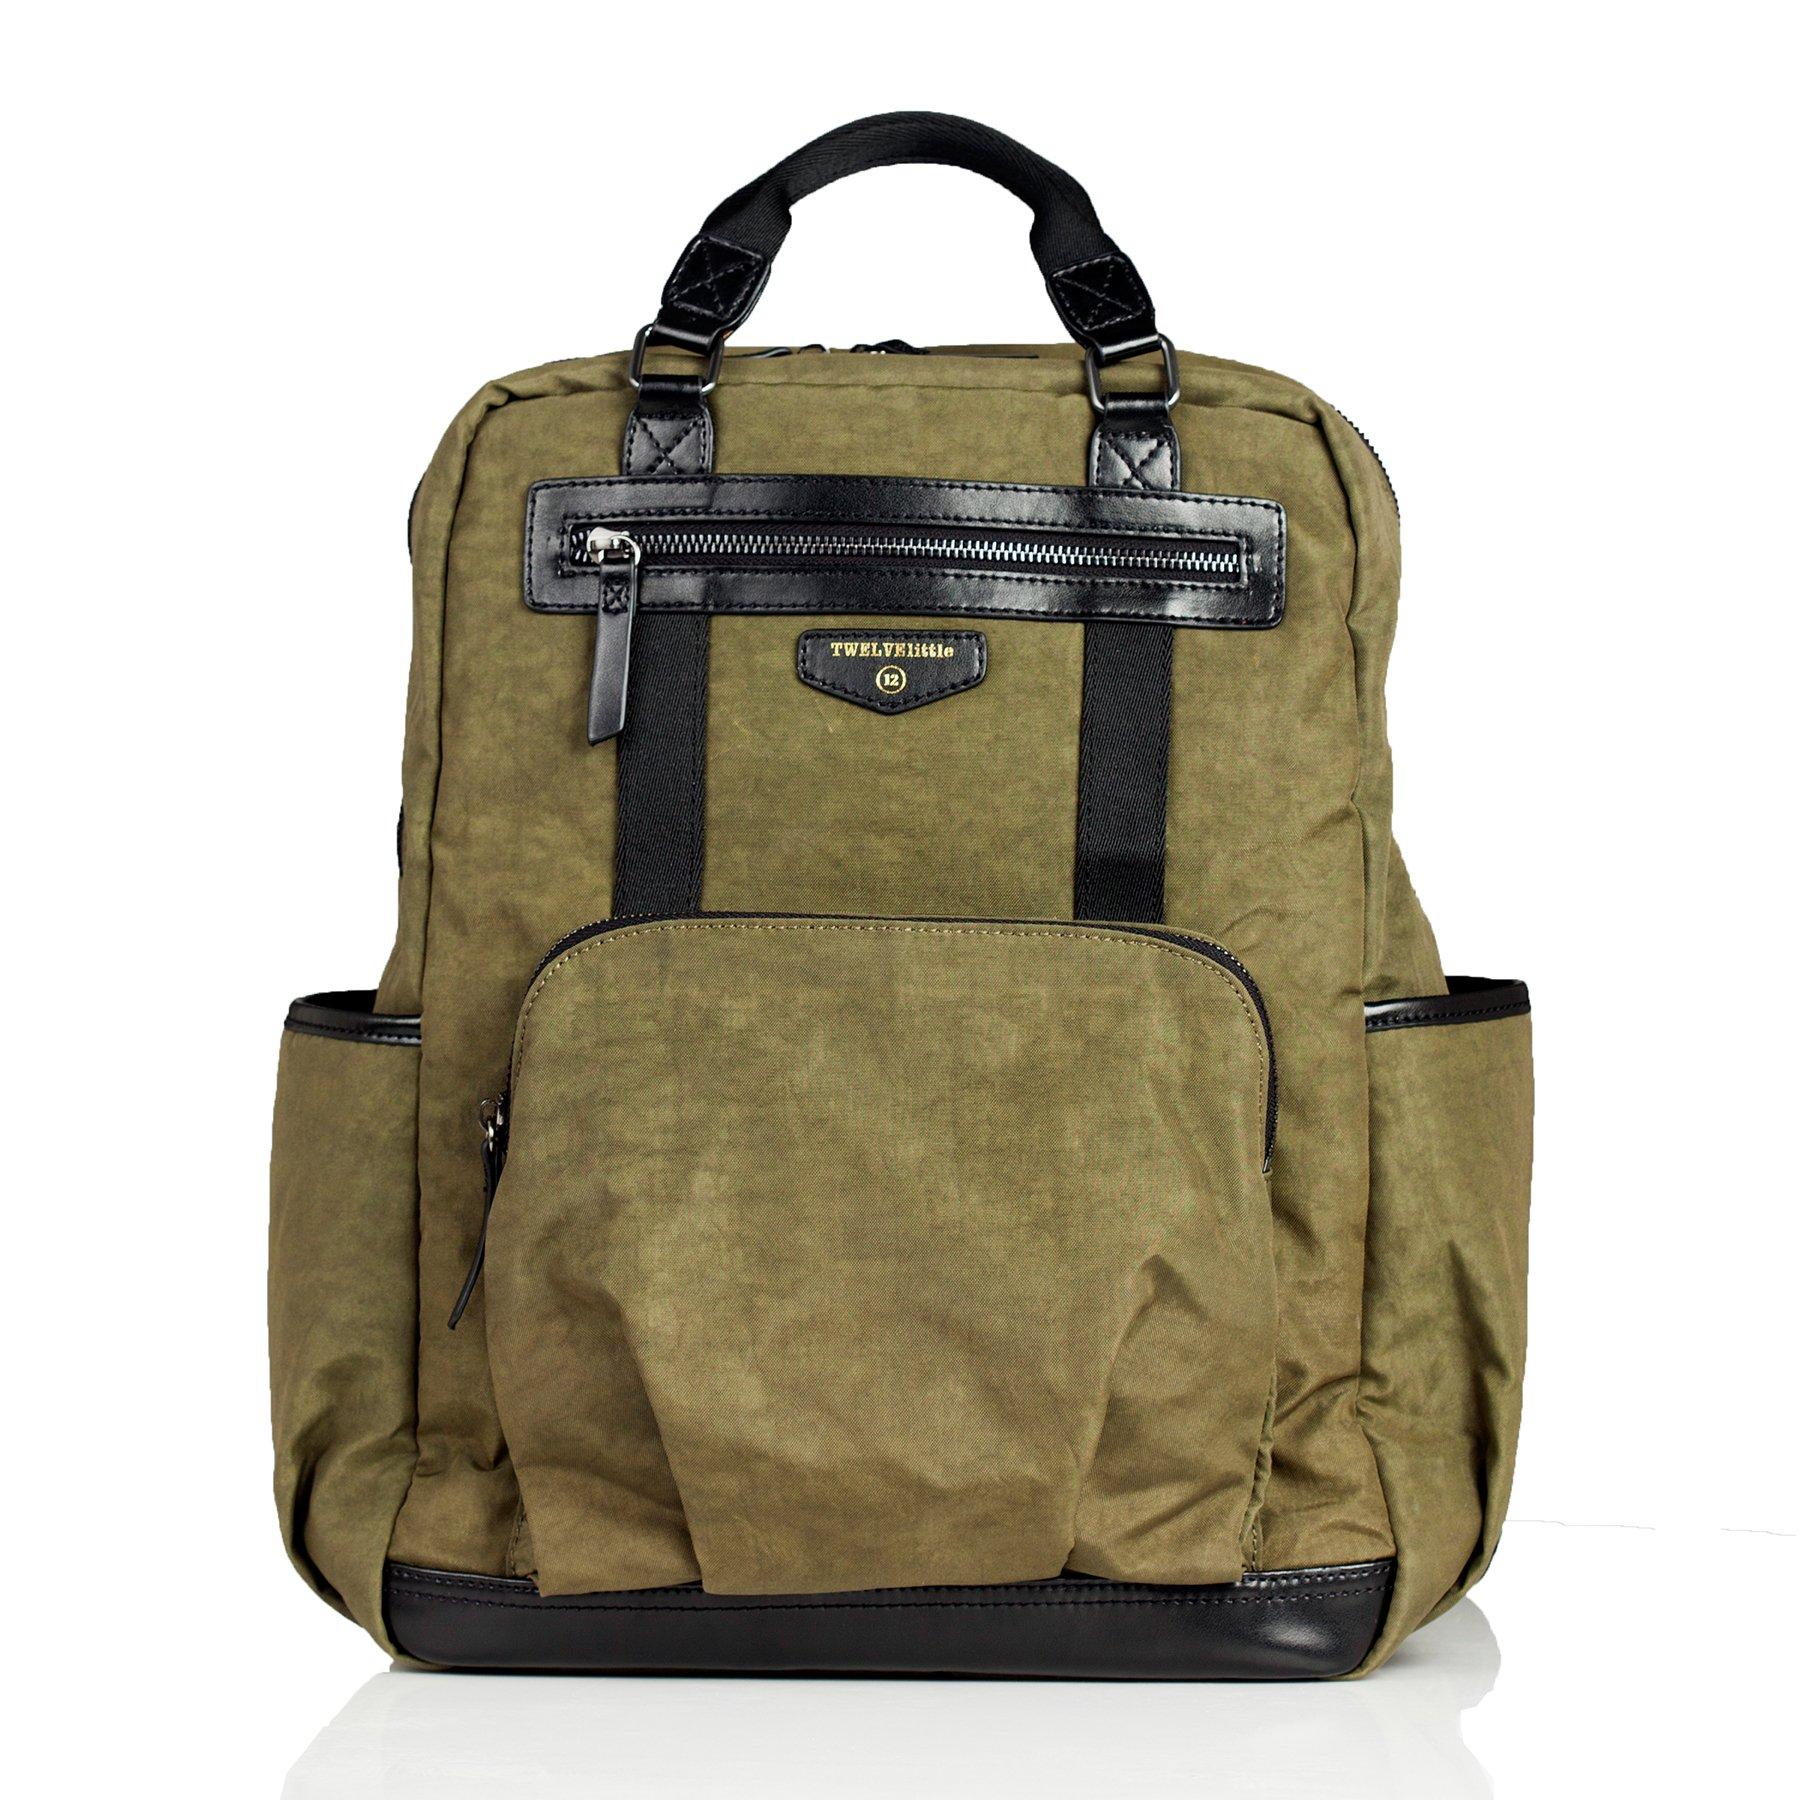 TWELVElittle Unisex Courage Backpack Diaper Bag, Olive